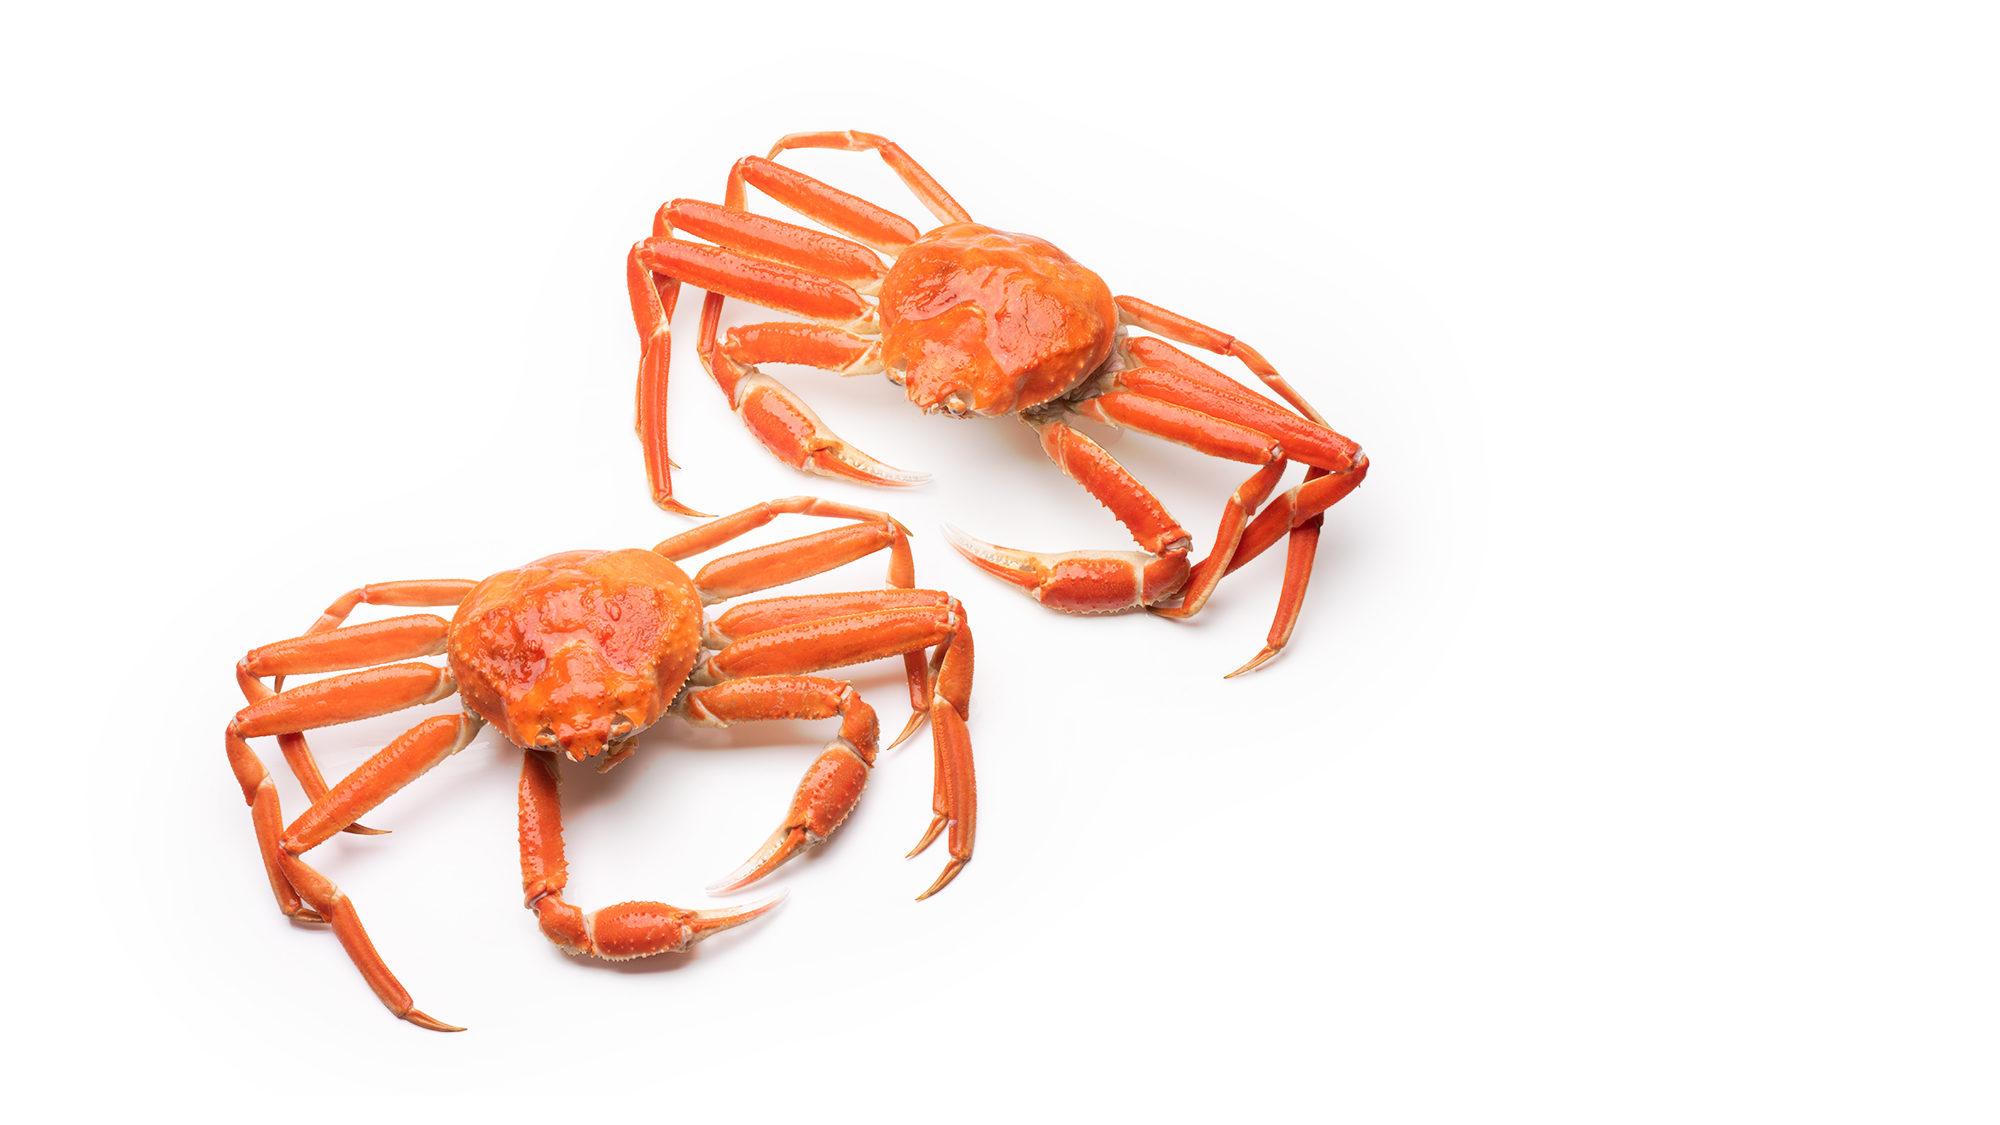 snow-crab-chionoecetes-opilio-product